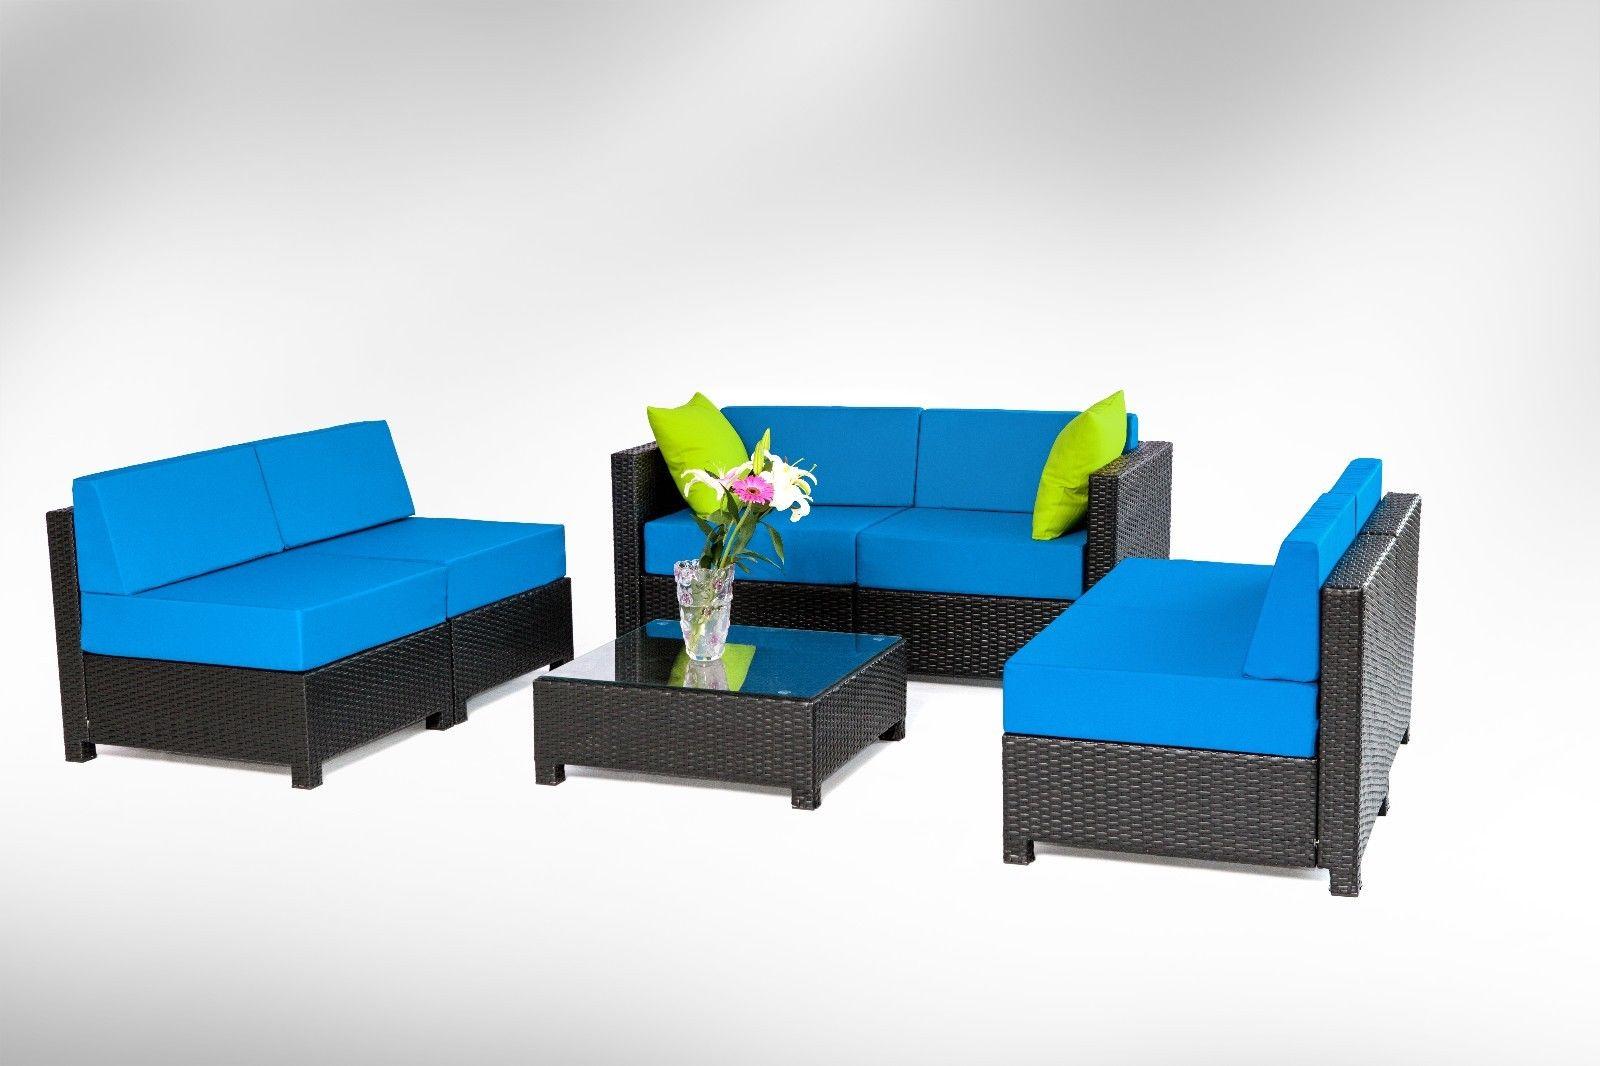 black aluminum outdoor sofa vintage oxblood chesterfield 7pc luxury wicker patio sectional indoor